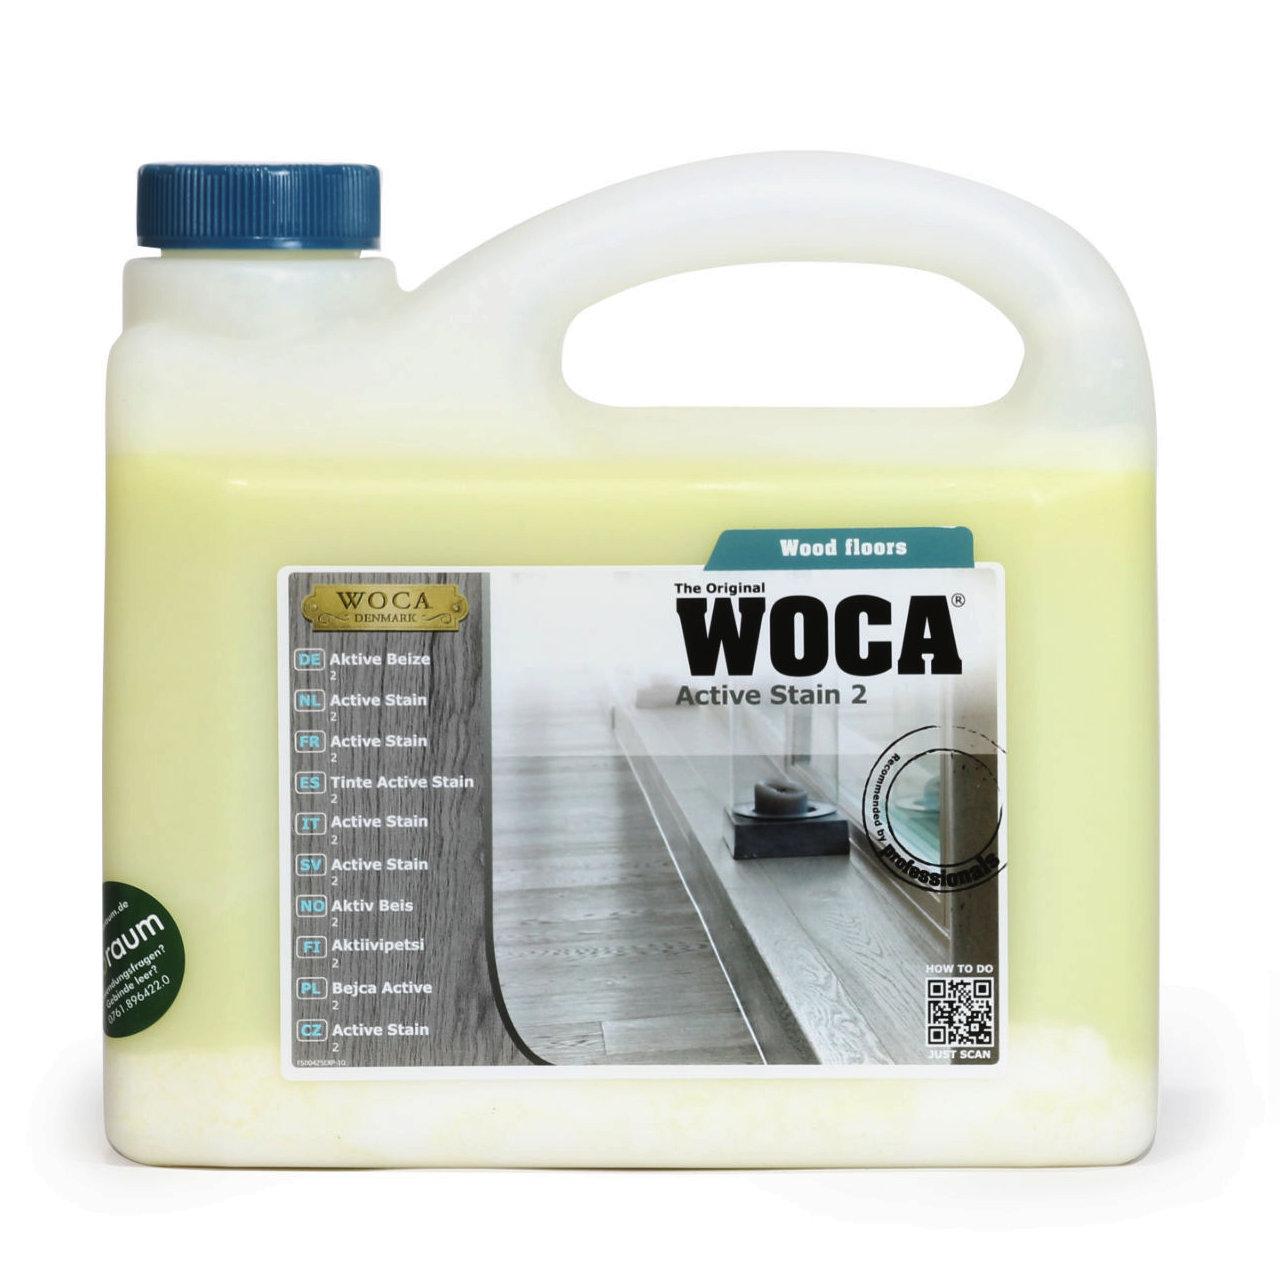 woca aktive beize 2, 2,5 liter | woca shop